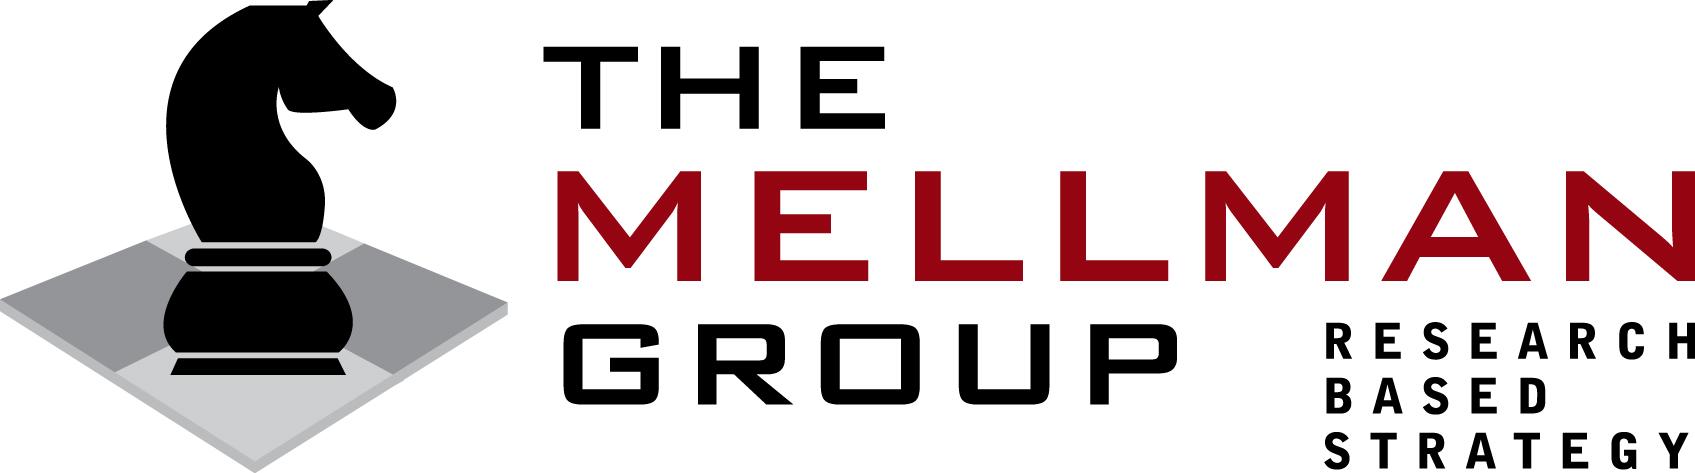 mellman-logo.jpg